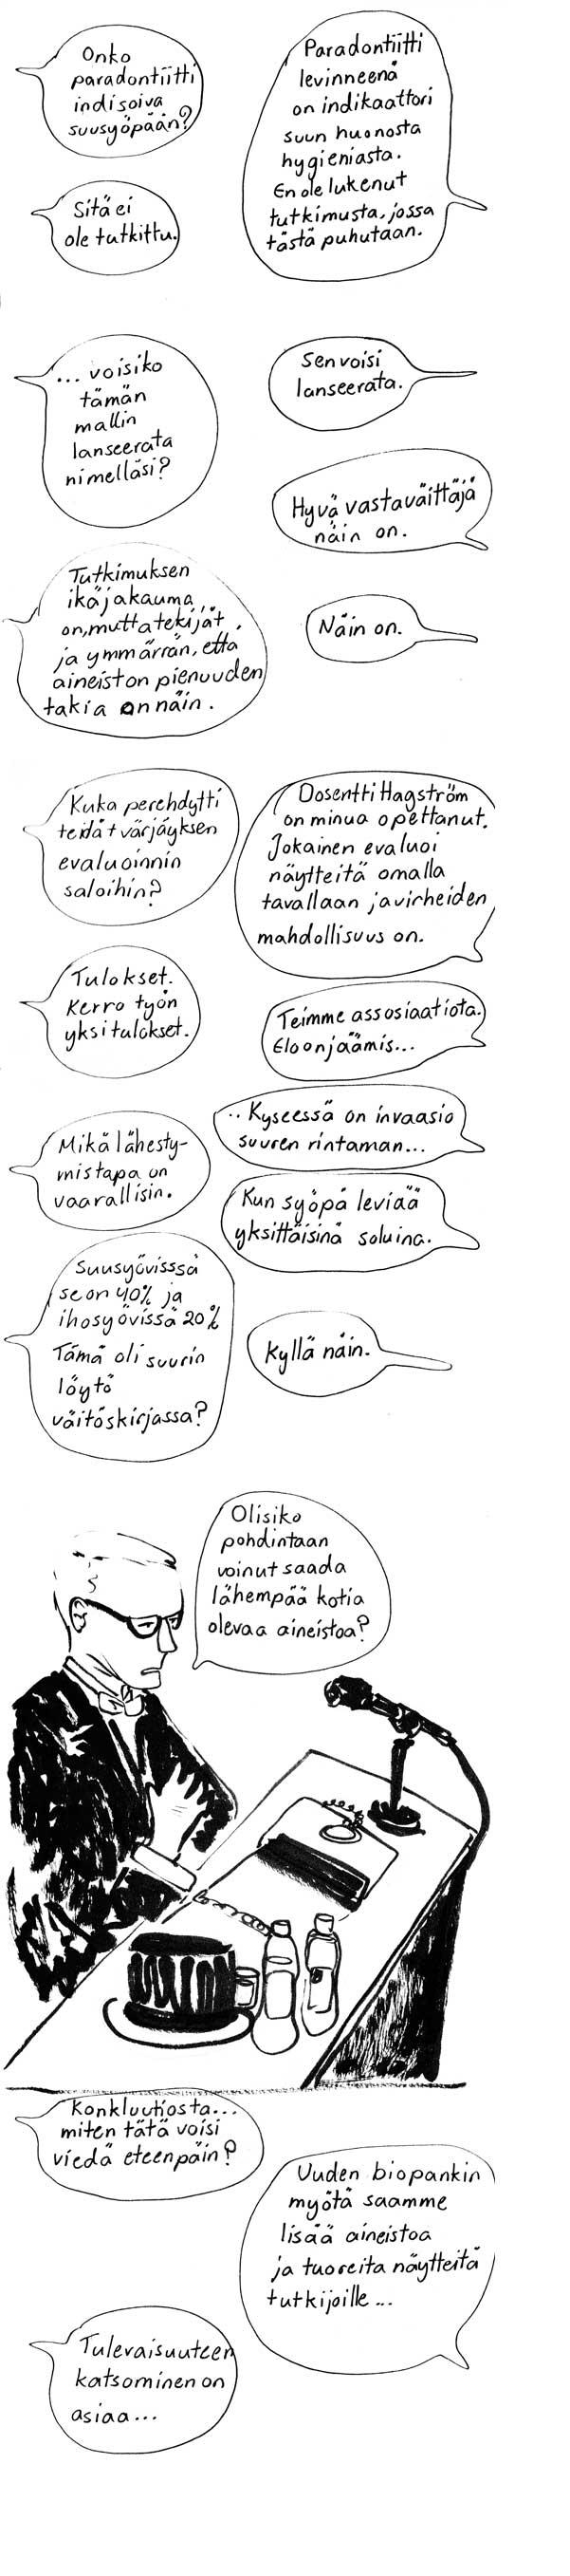 abuvaitososa3net